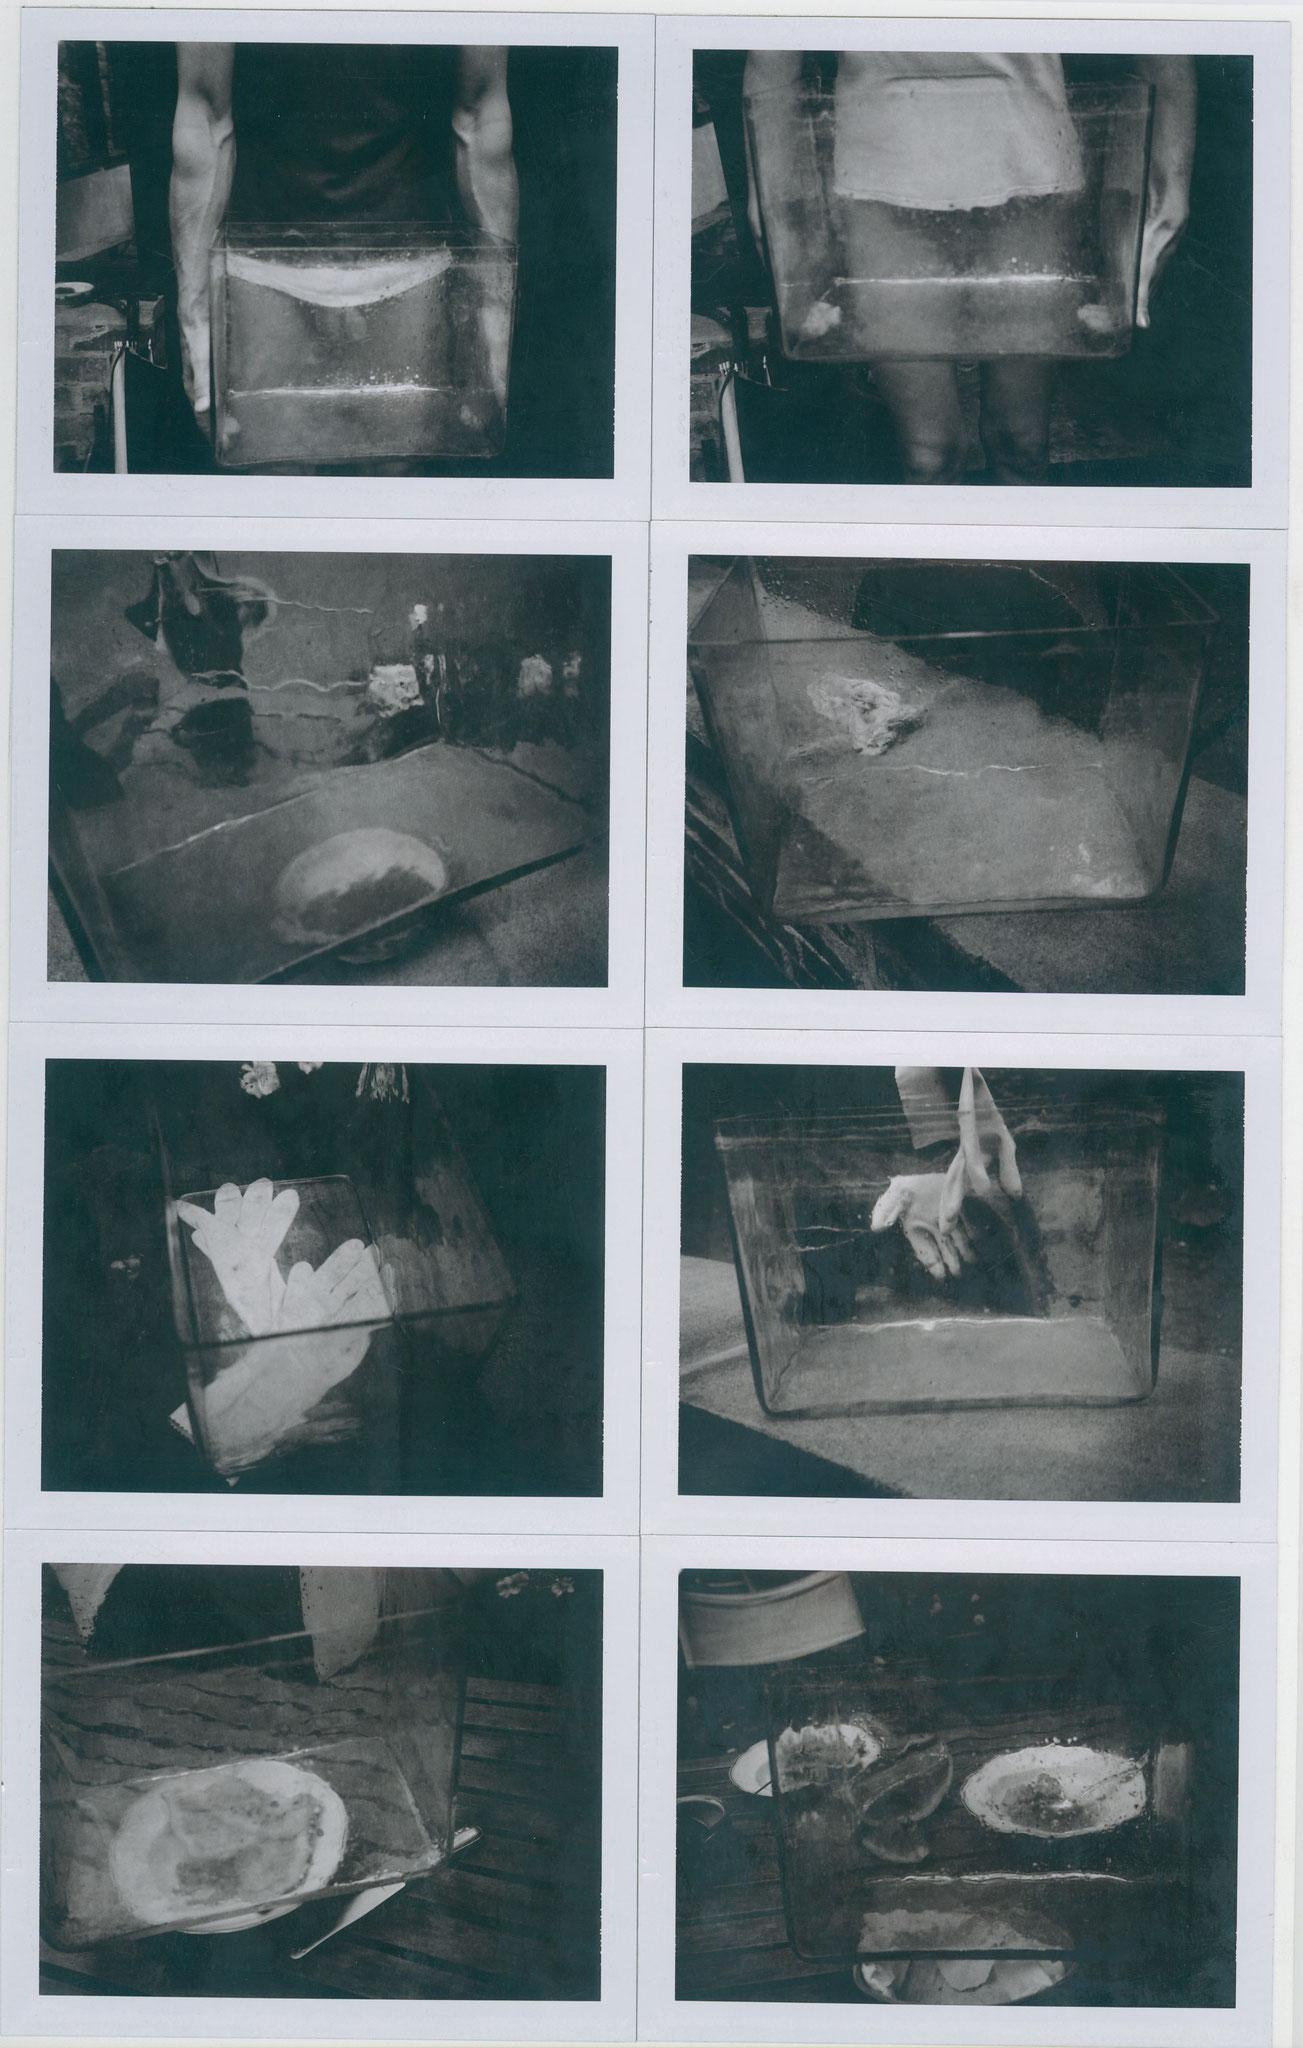 Manfred Paul - Selbstporträts - Polaroids  1980er Jahre